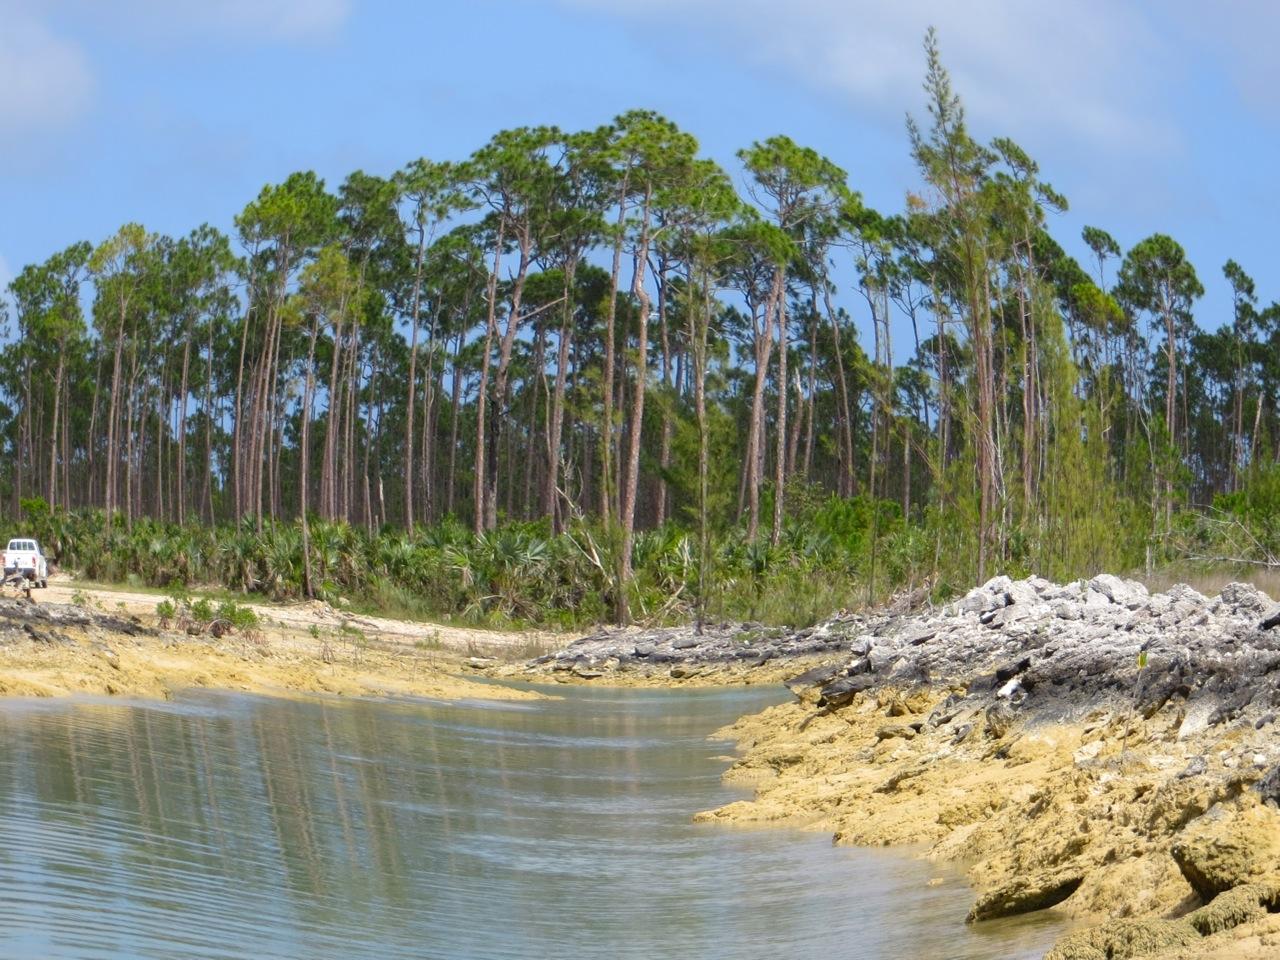 Nettie's Point, Abaco - channel water phenomenon